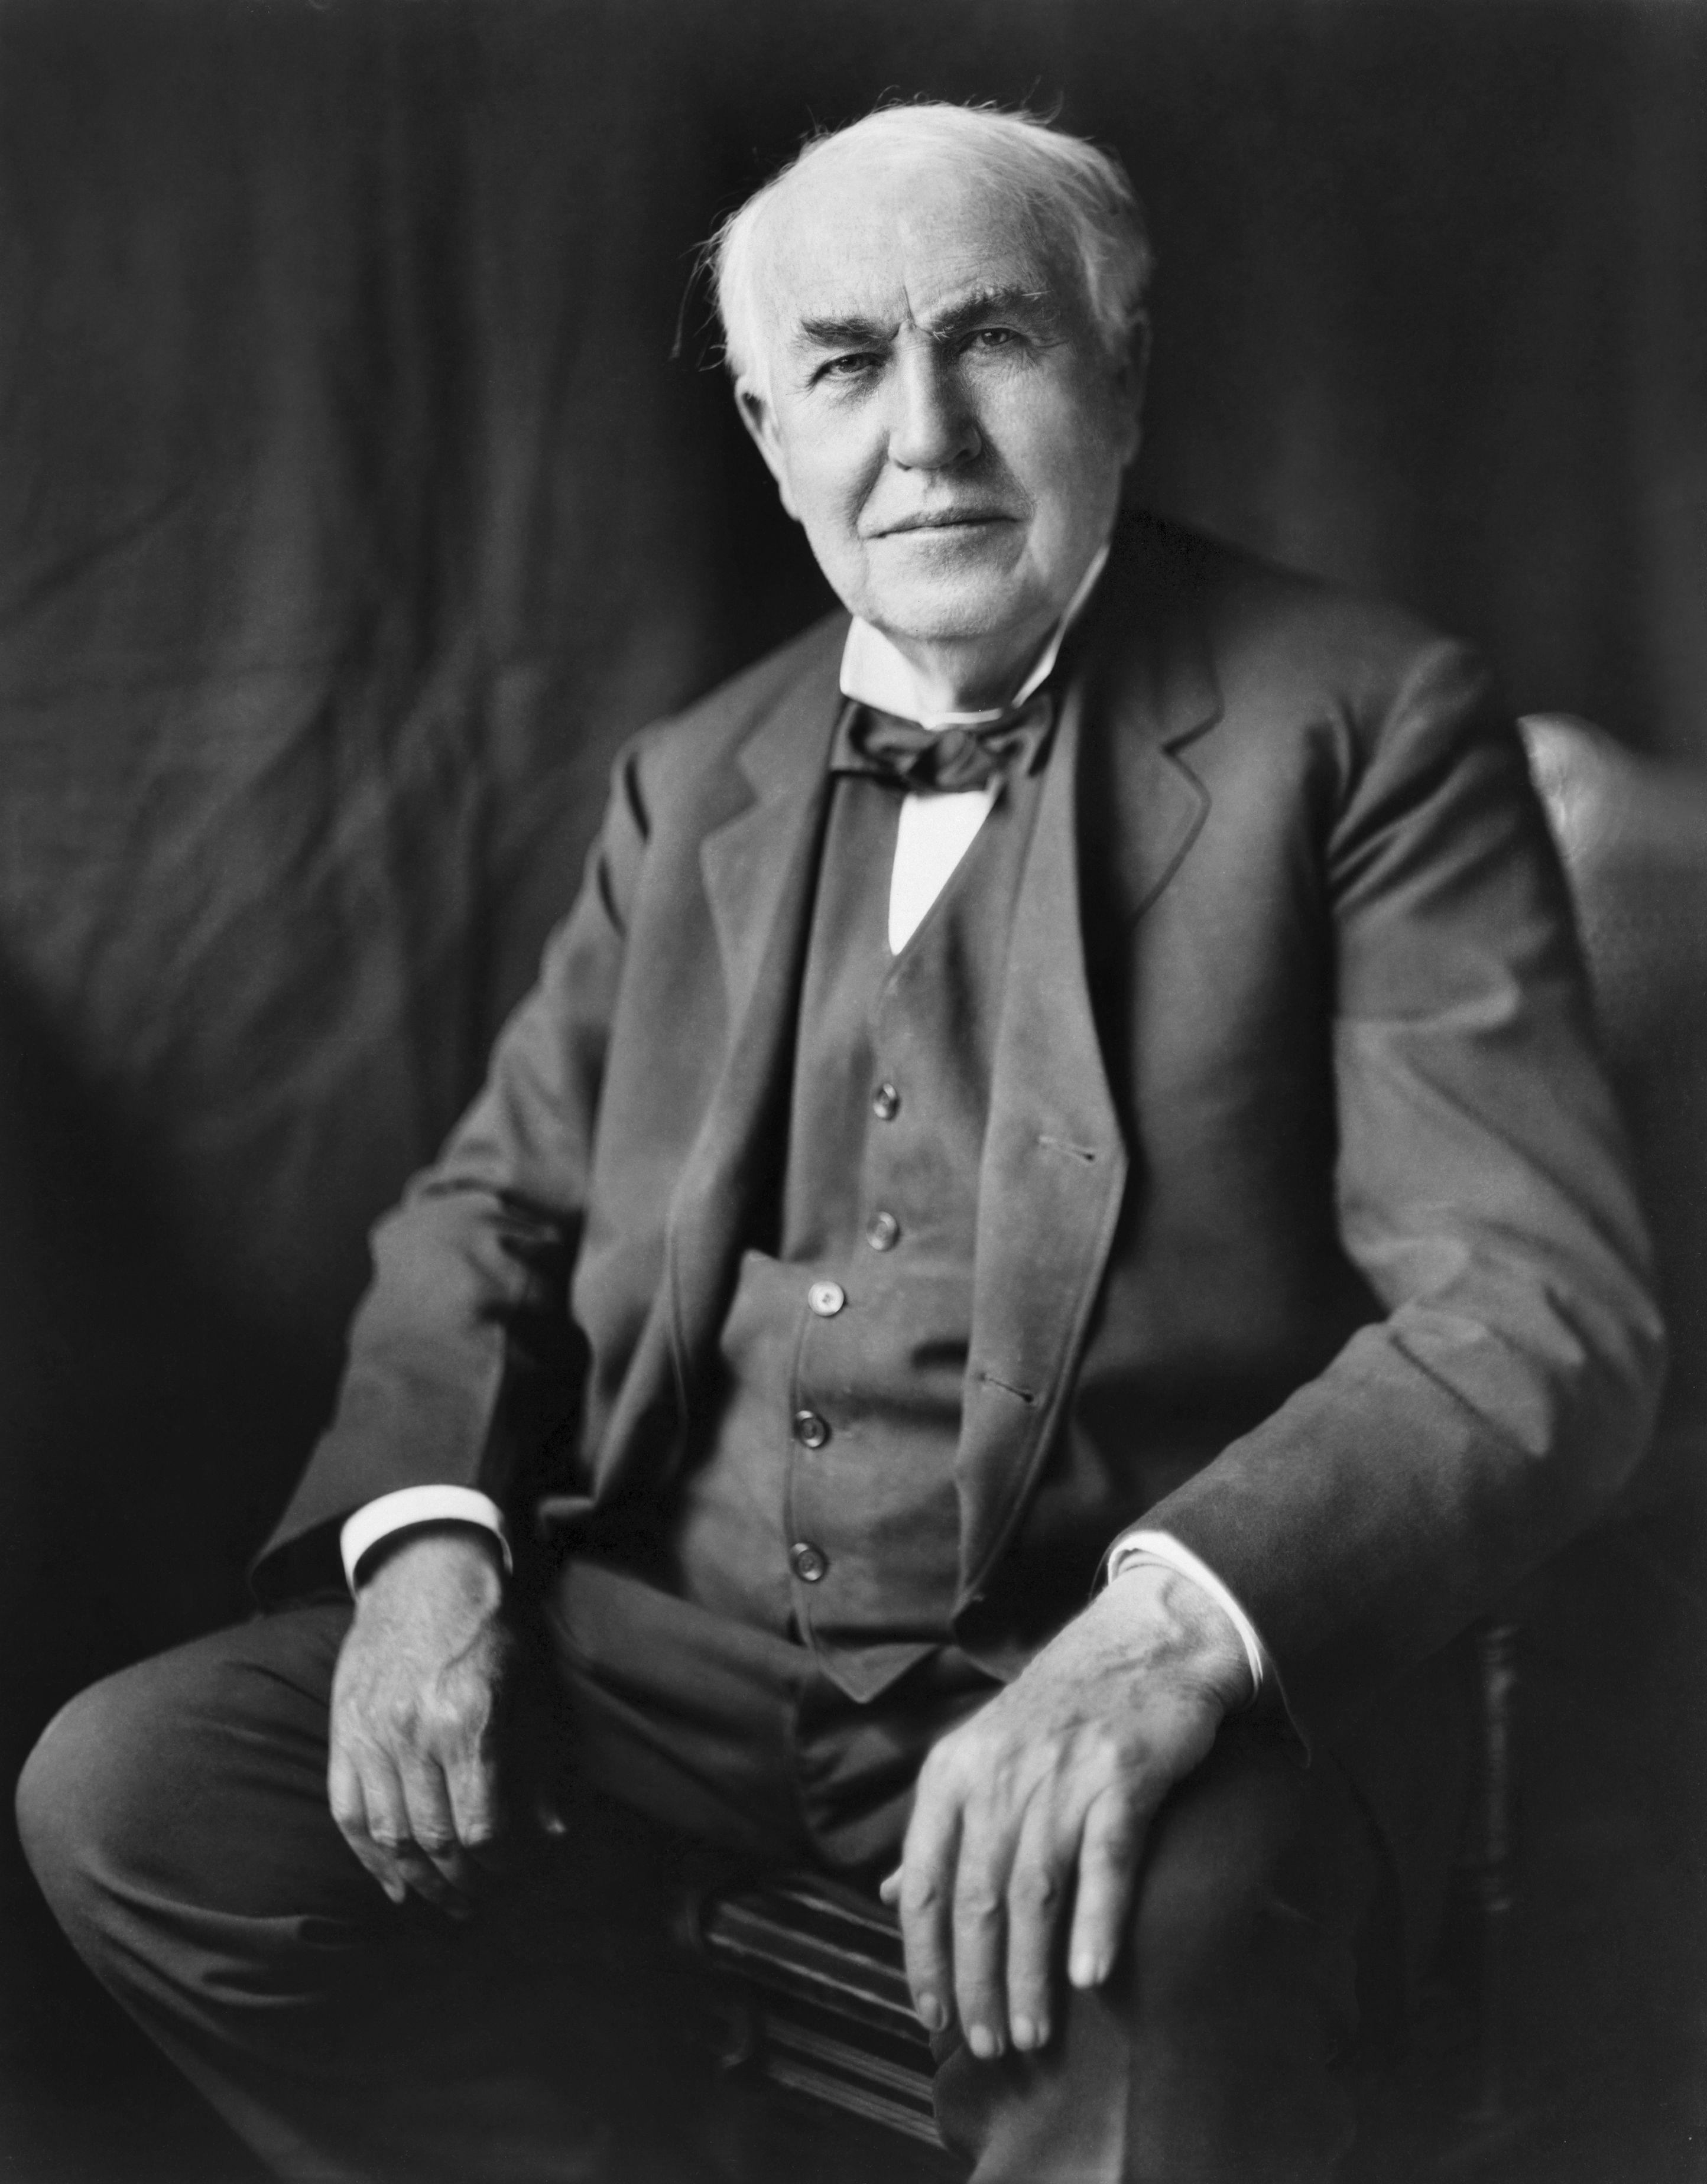 Thomas Edison, inventore